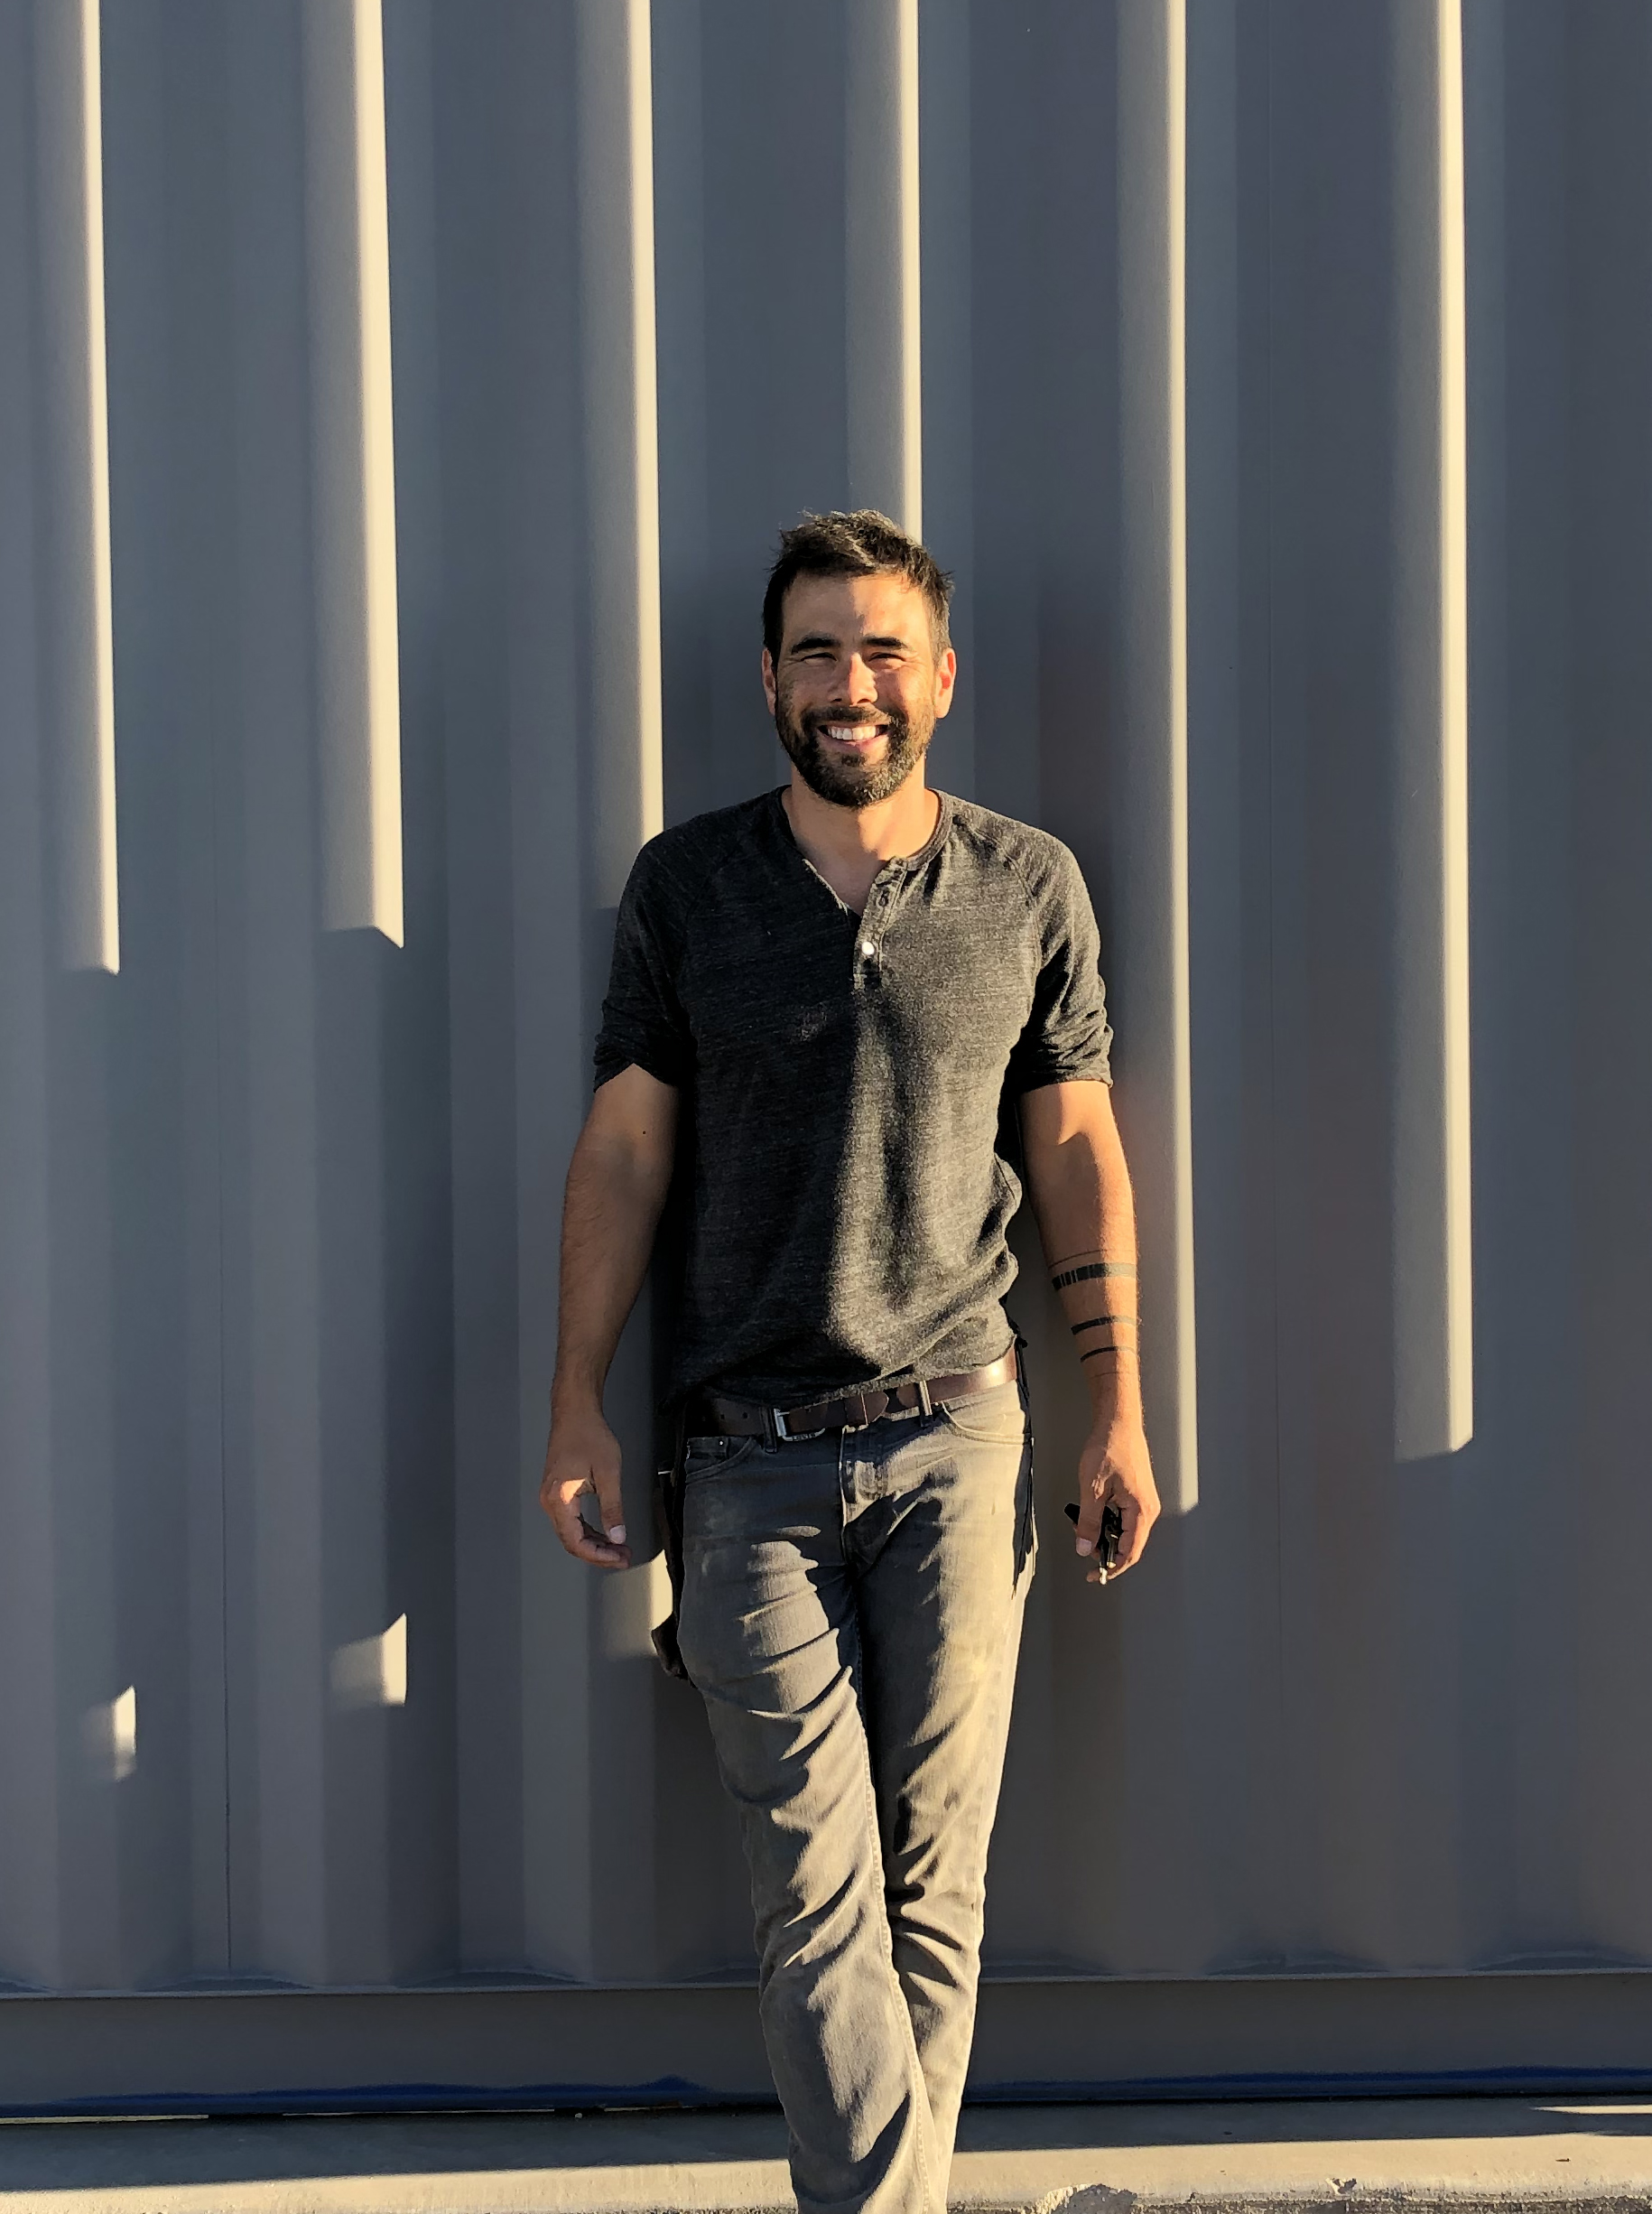 Ben Uyeda  Founder of The Modern Home Project